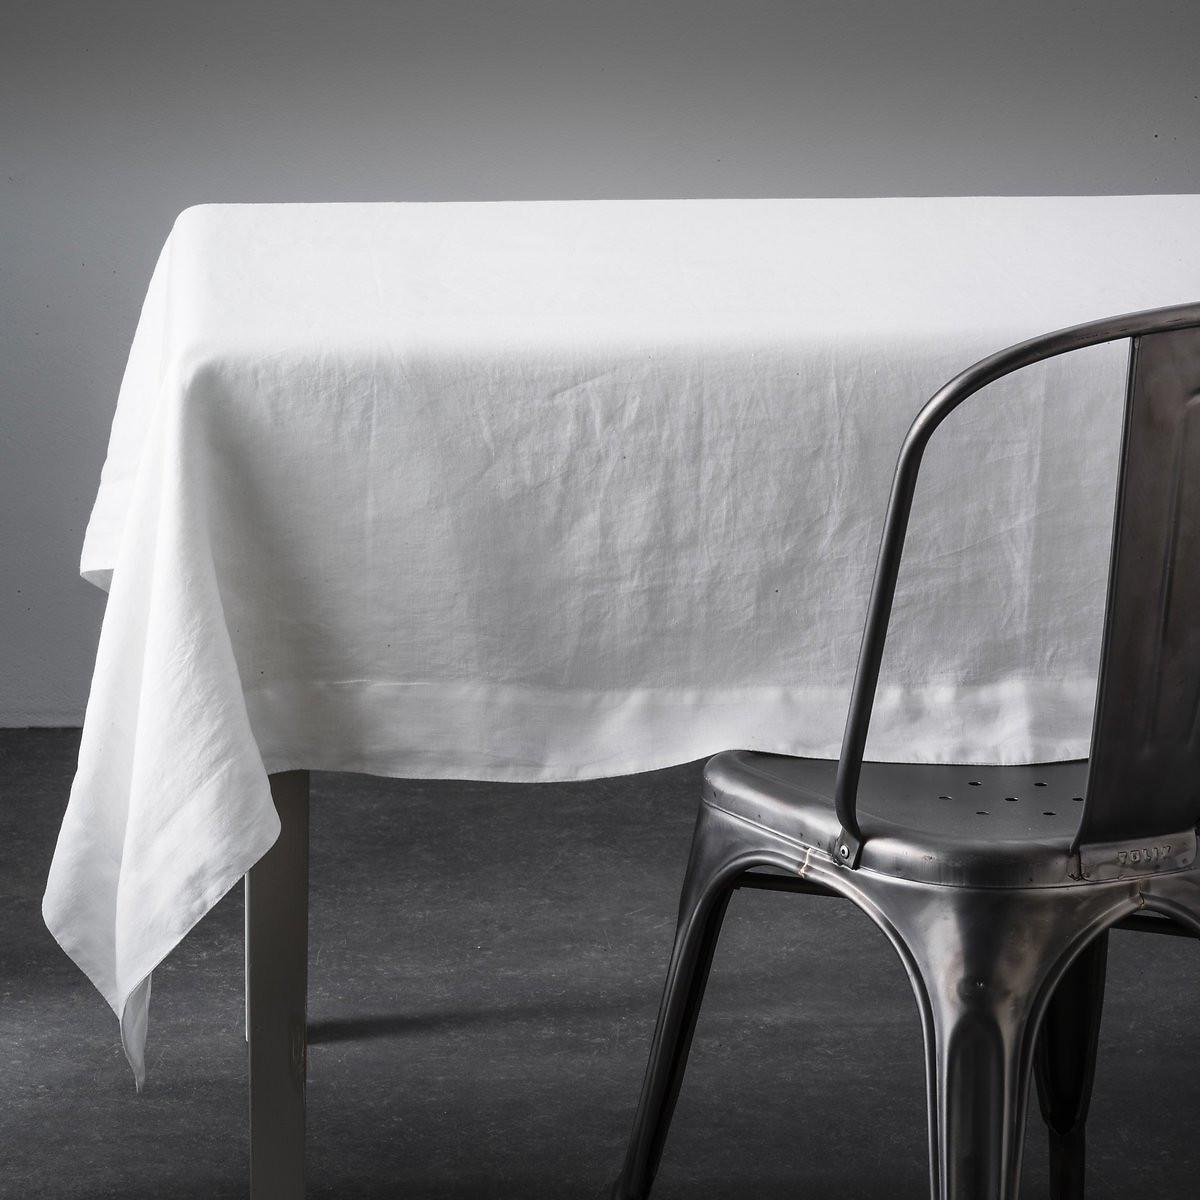 Скатерть LaRedoute Из льна Linette 180 x 250 см белый